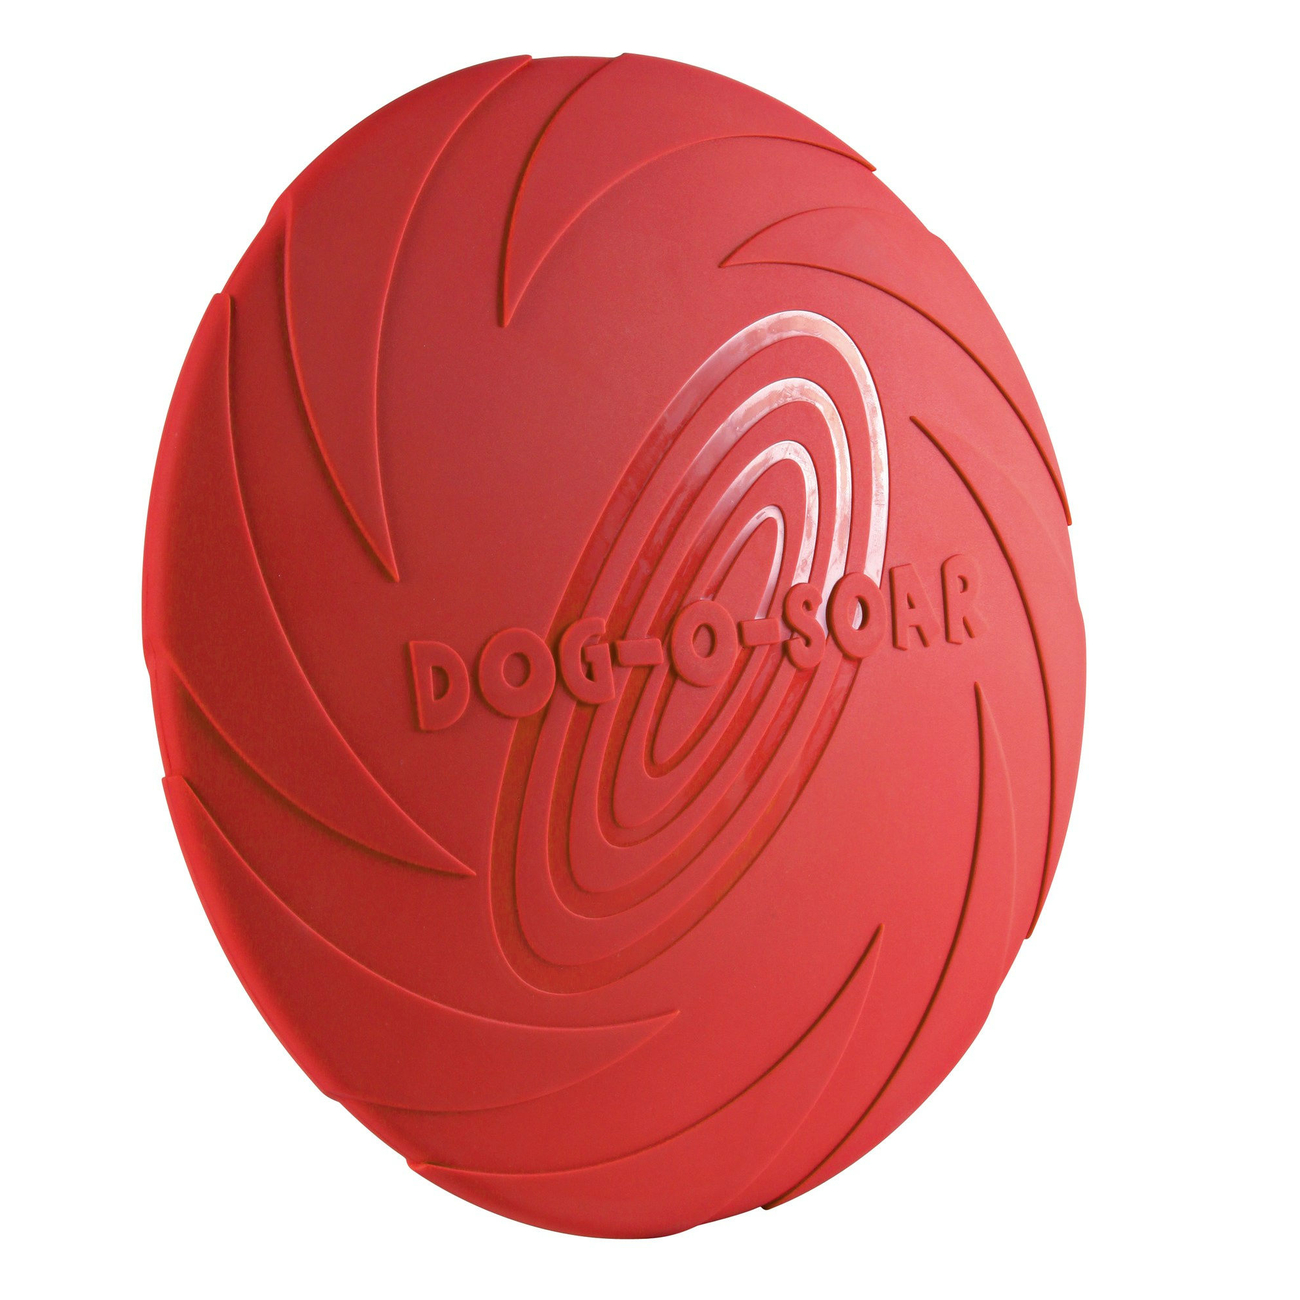 Trixie Dog Disc Hundefrisbee aus Gummi 33500, Bild 4